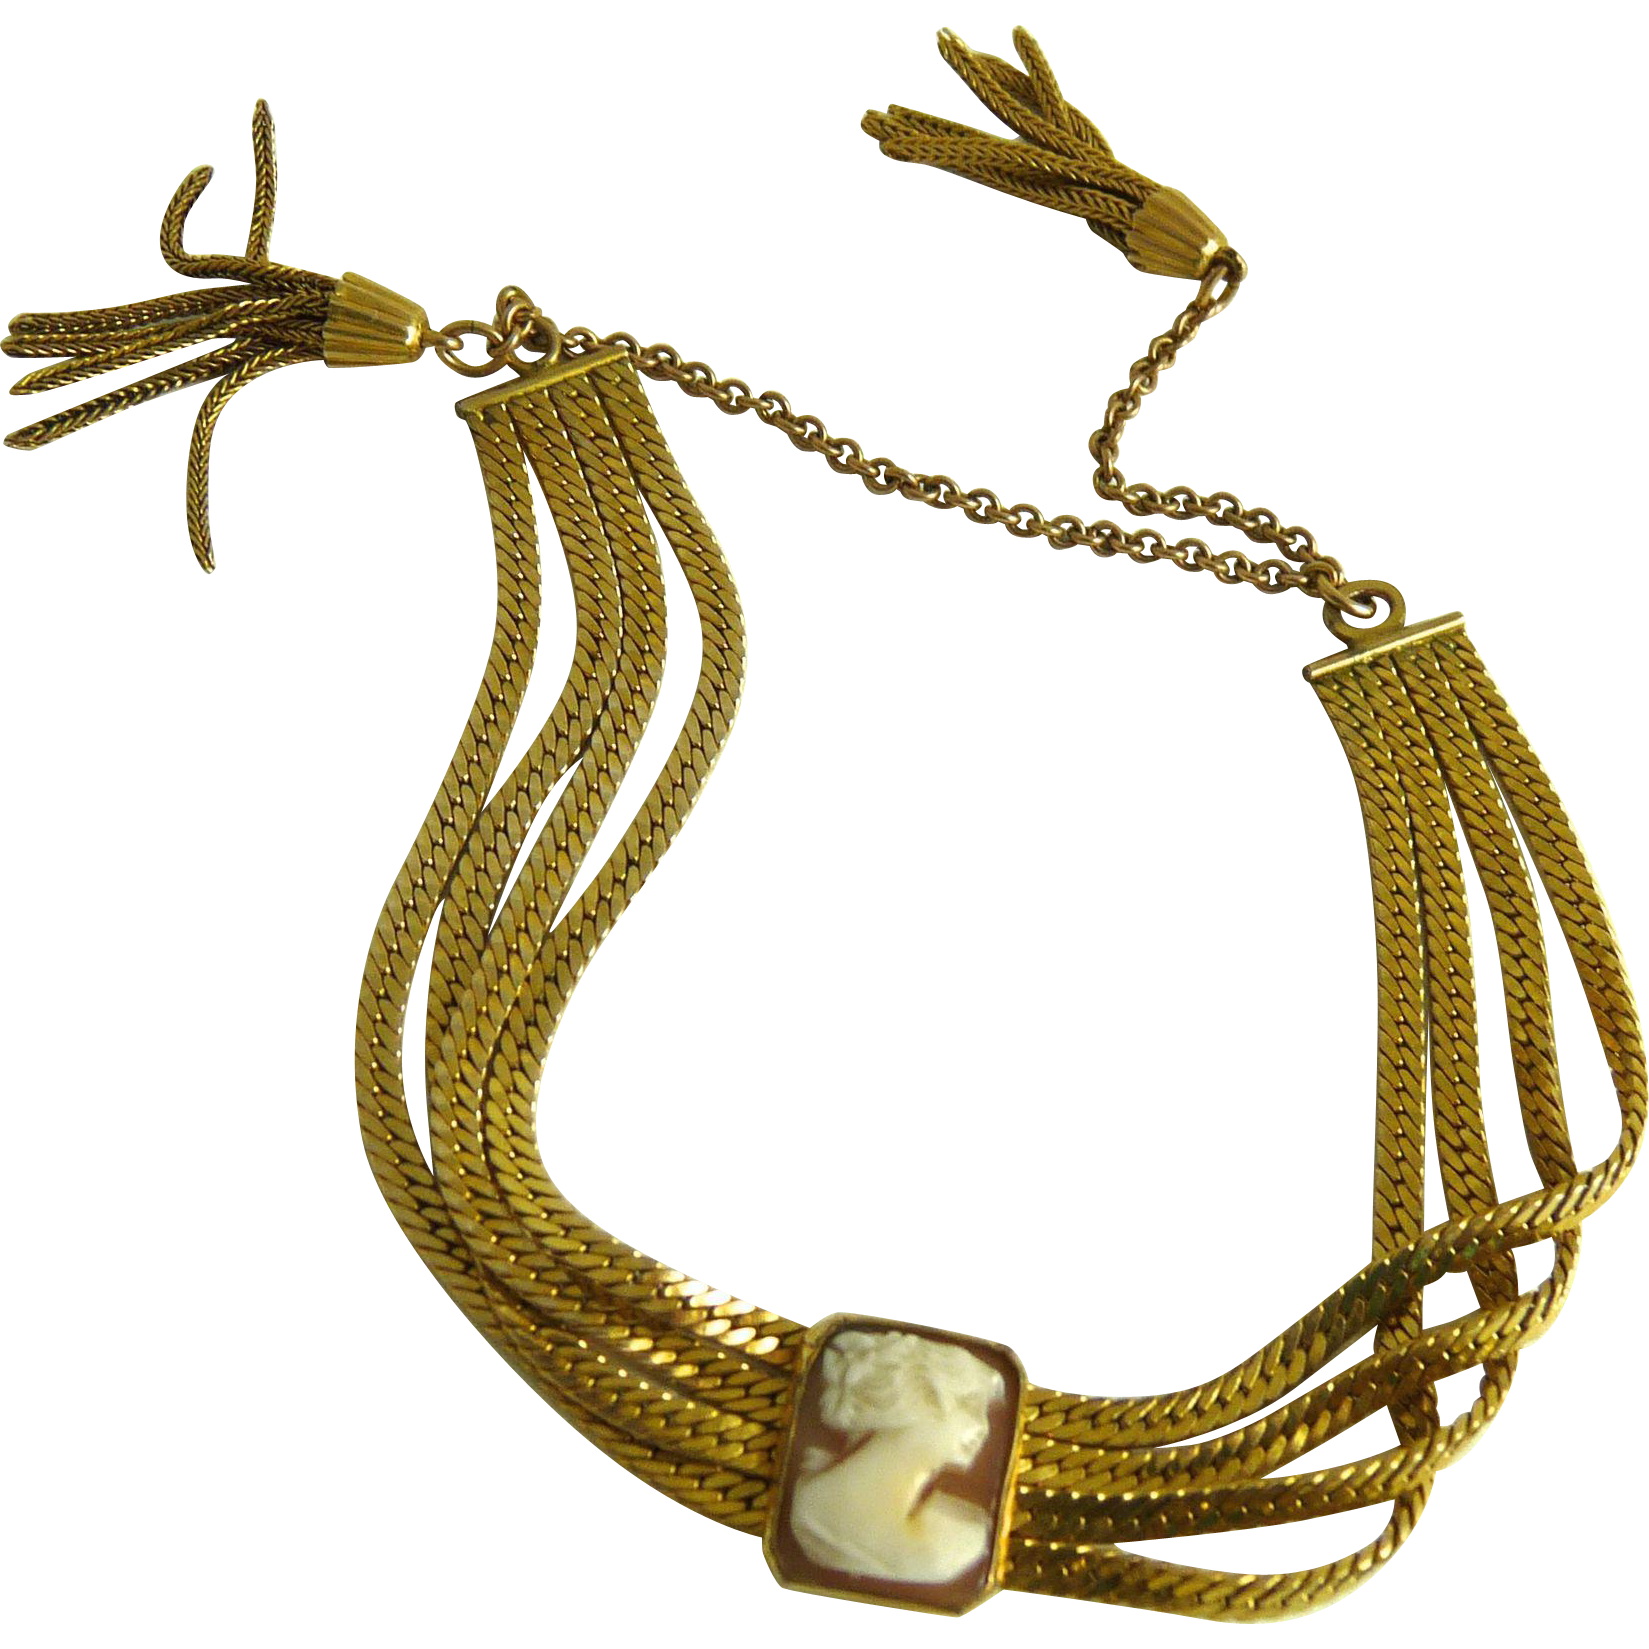 Vintage Gold Filled Shell Cameo Bracelet with Tassels